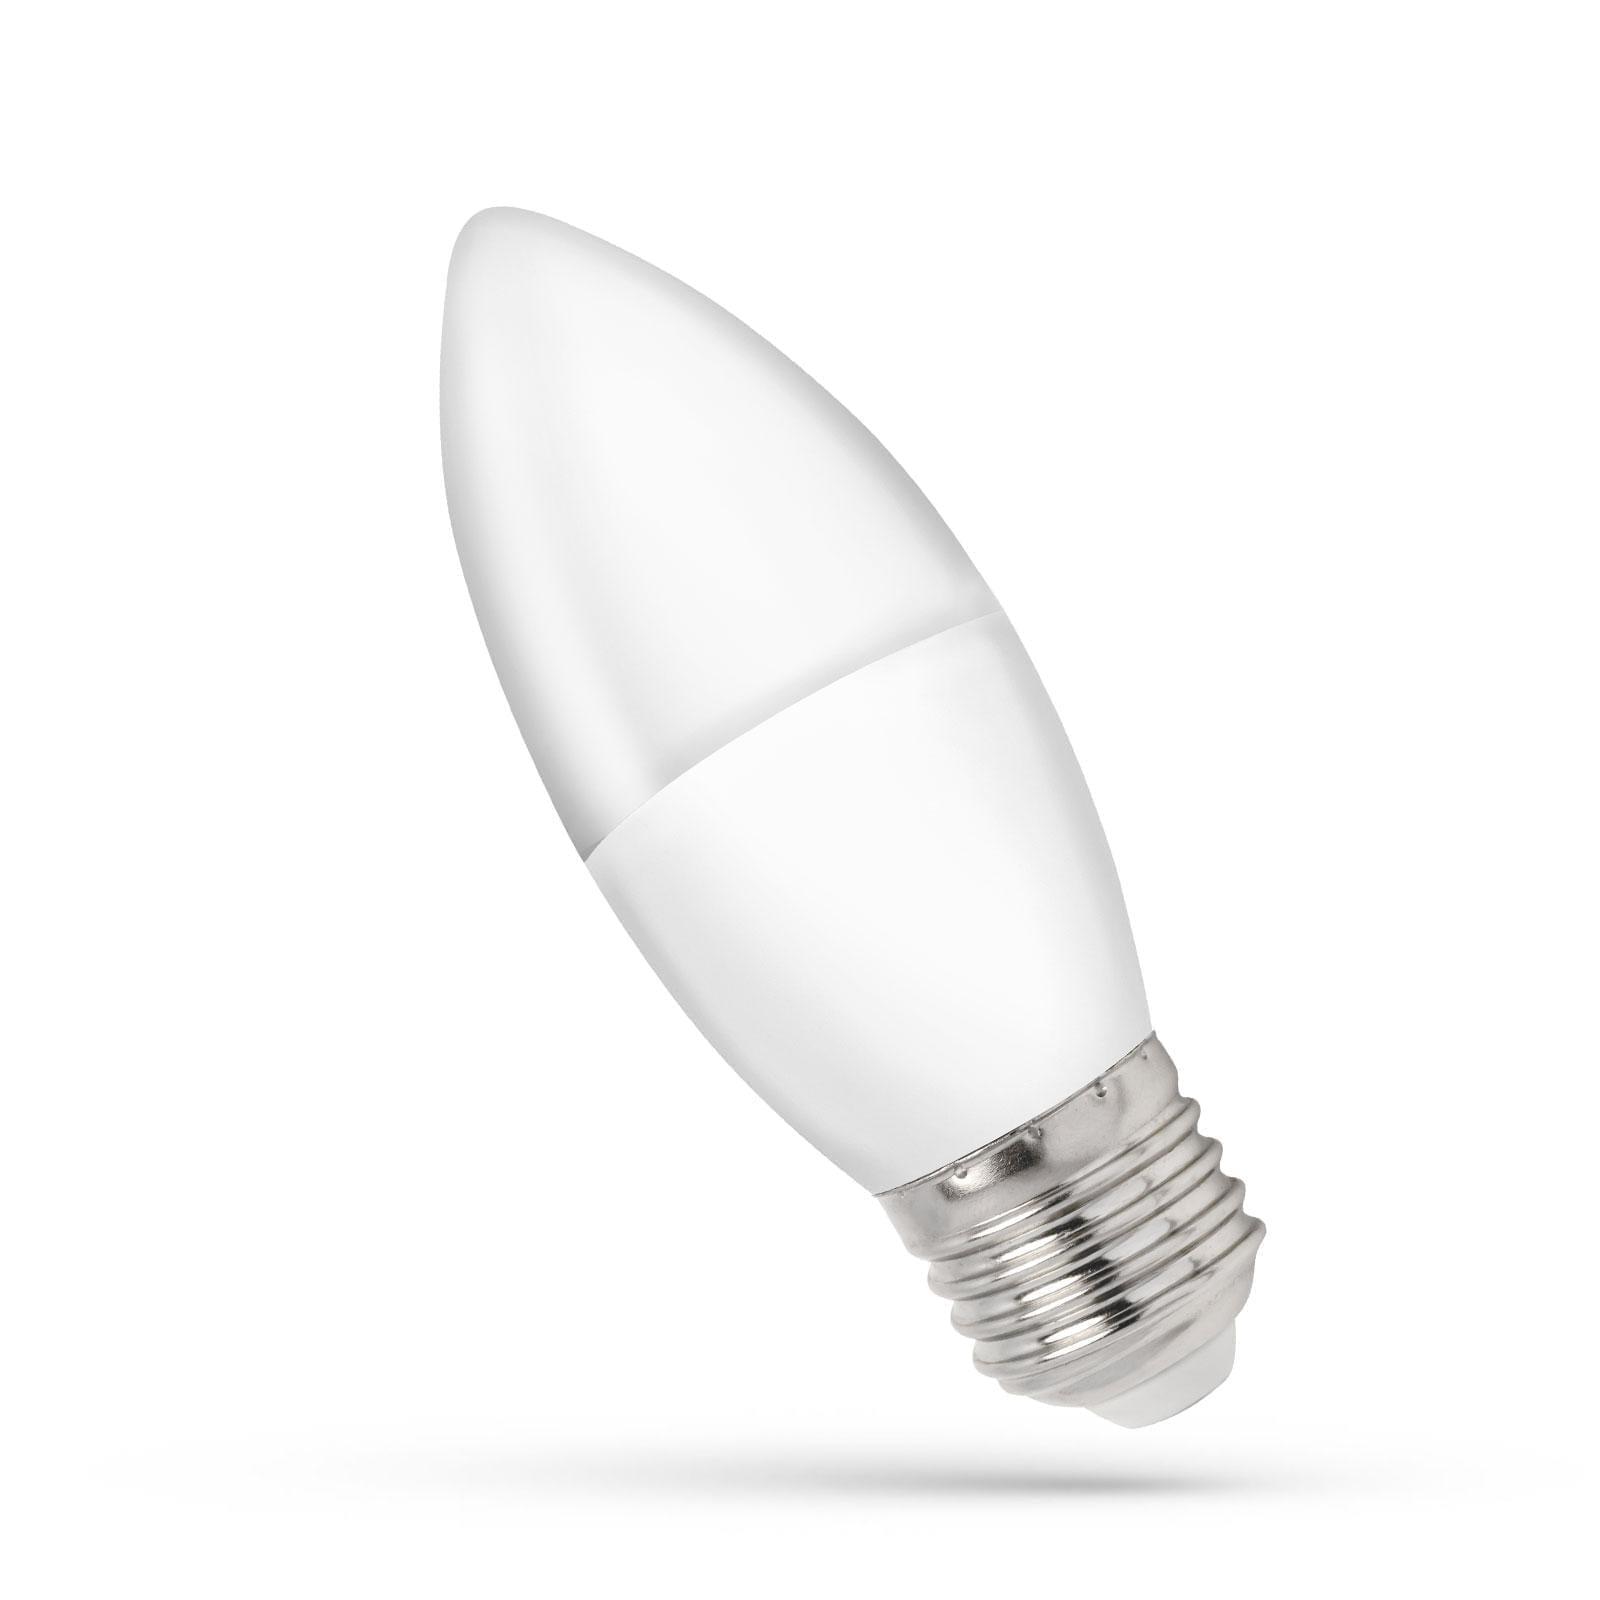 1W E27 LED lemputė žvakutė